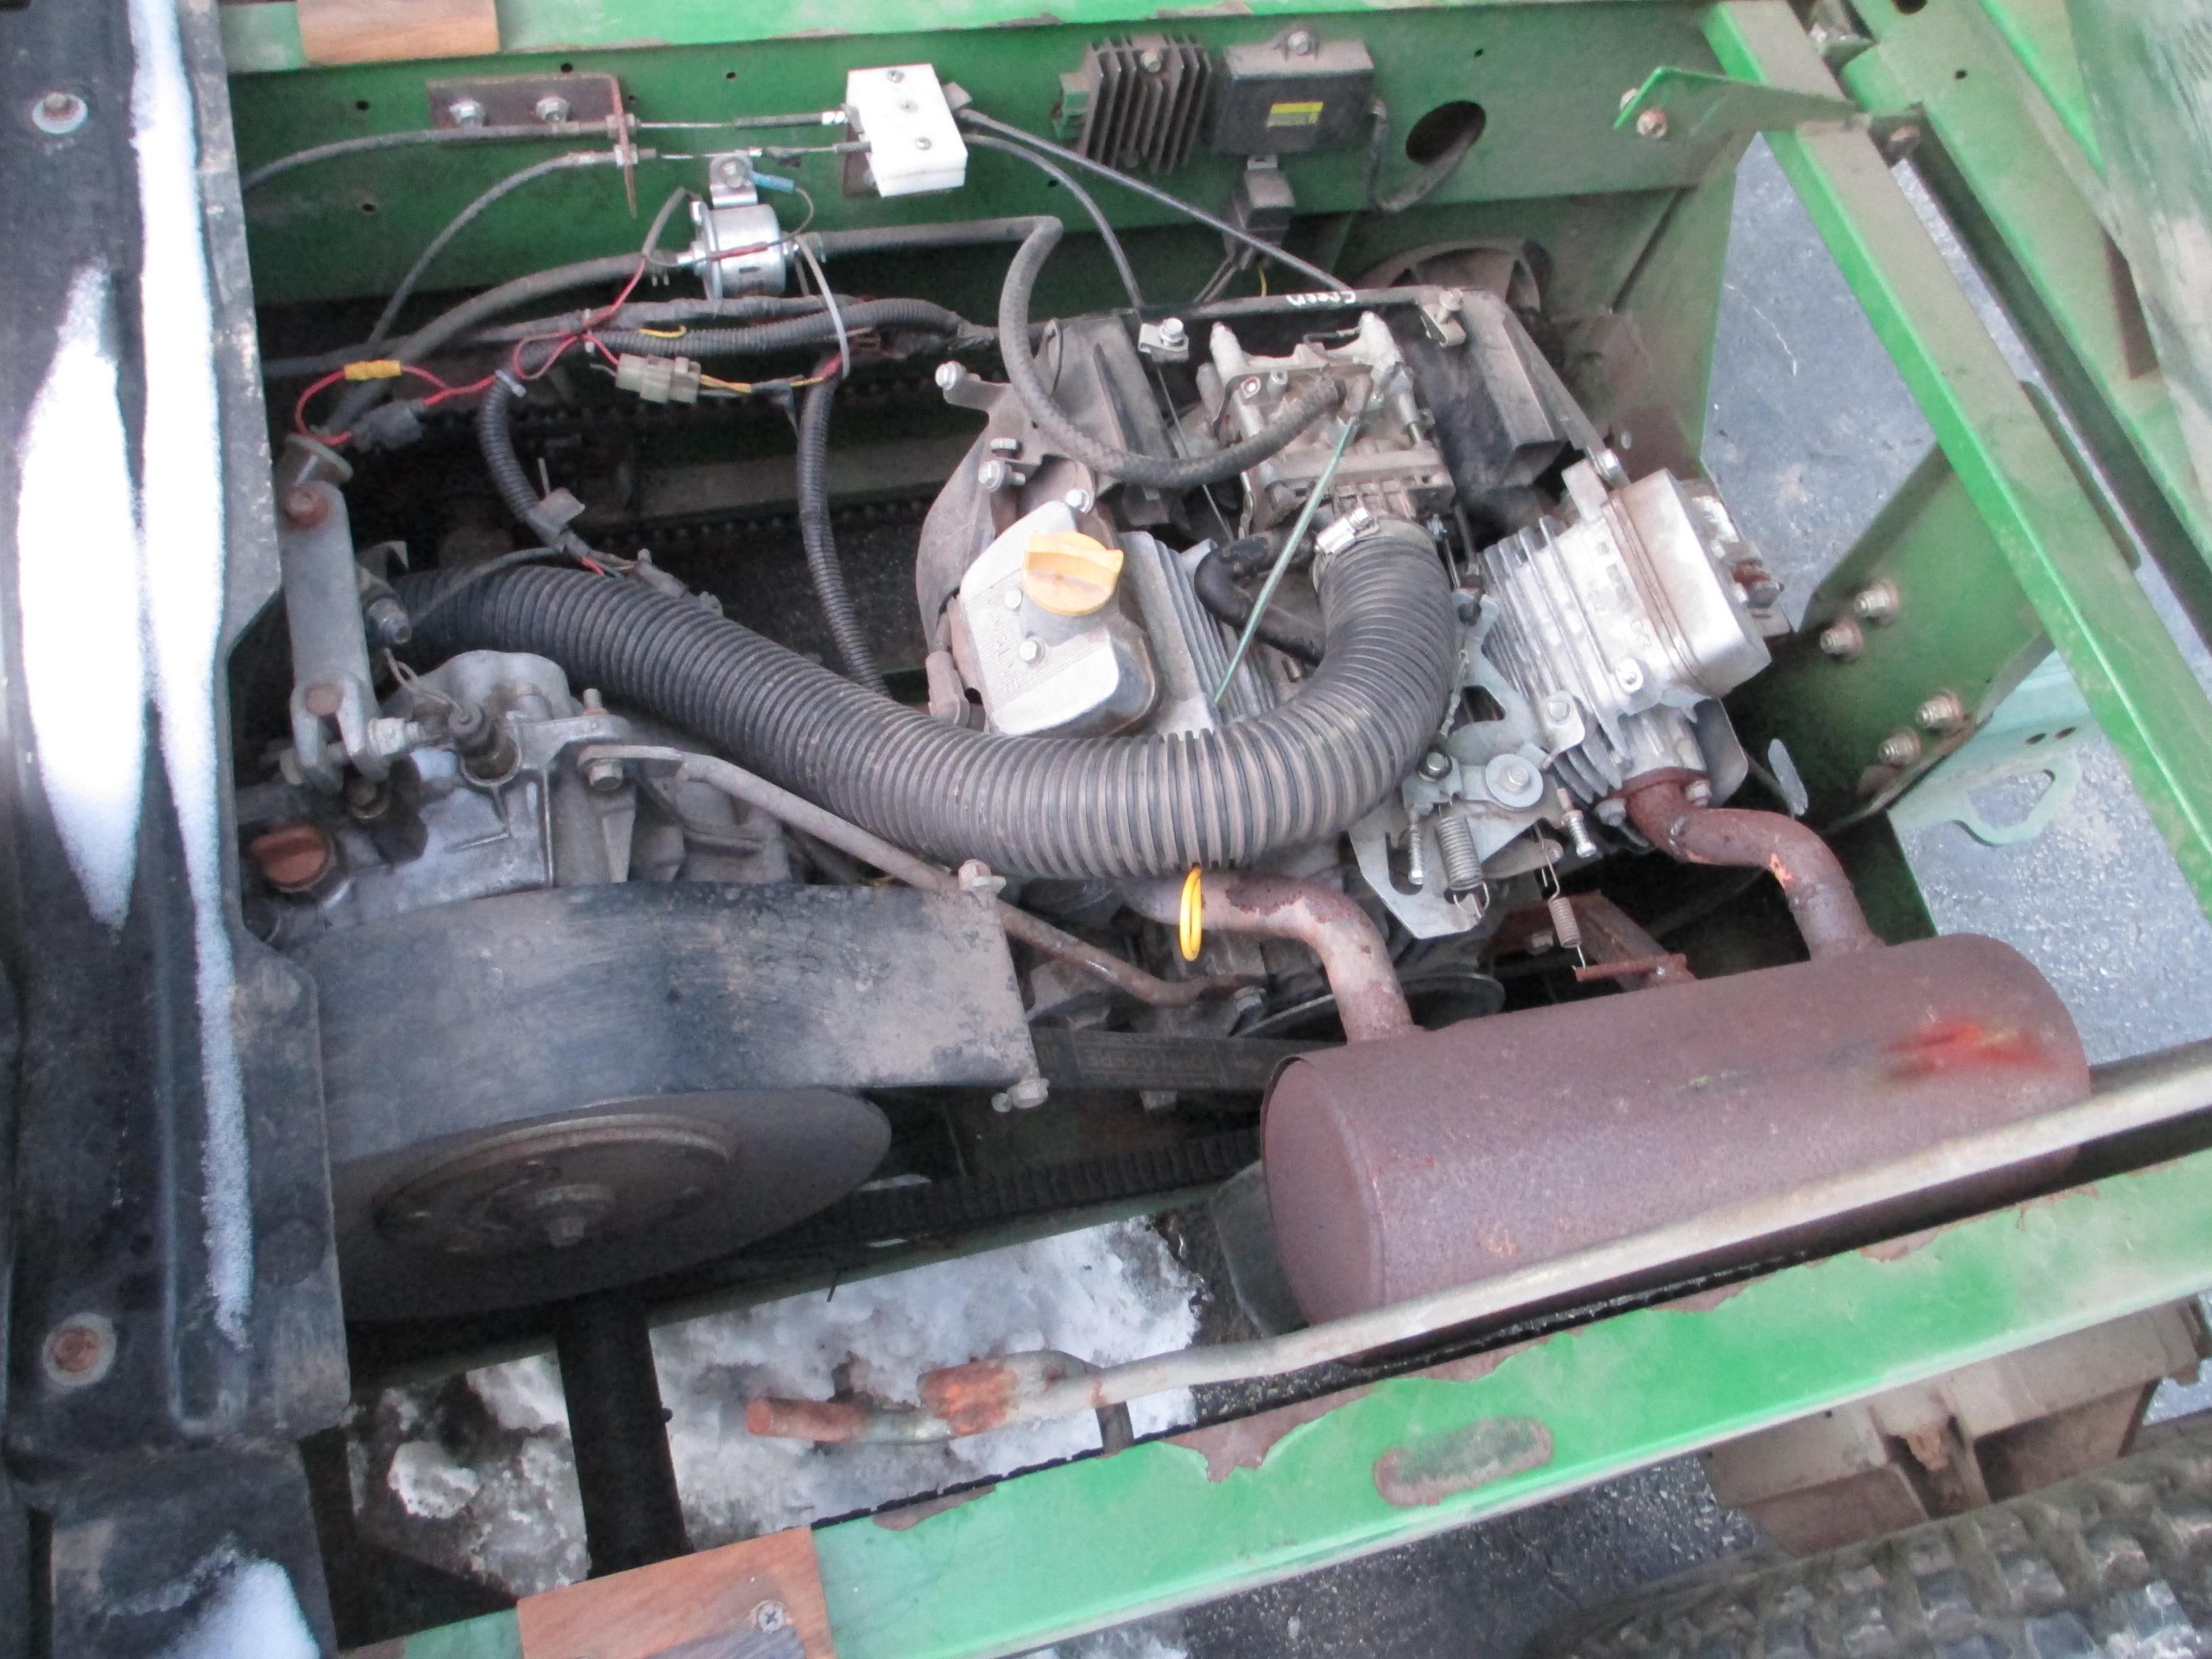 Gator 6x4 original engine vs B&S Vanguard - John Deere Gator